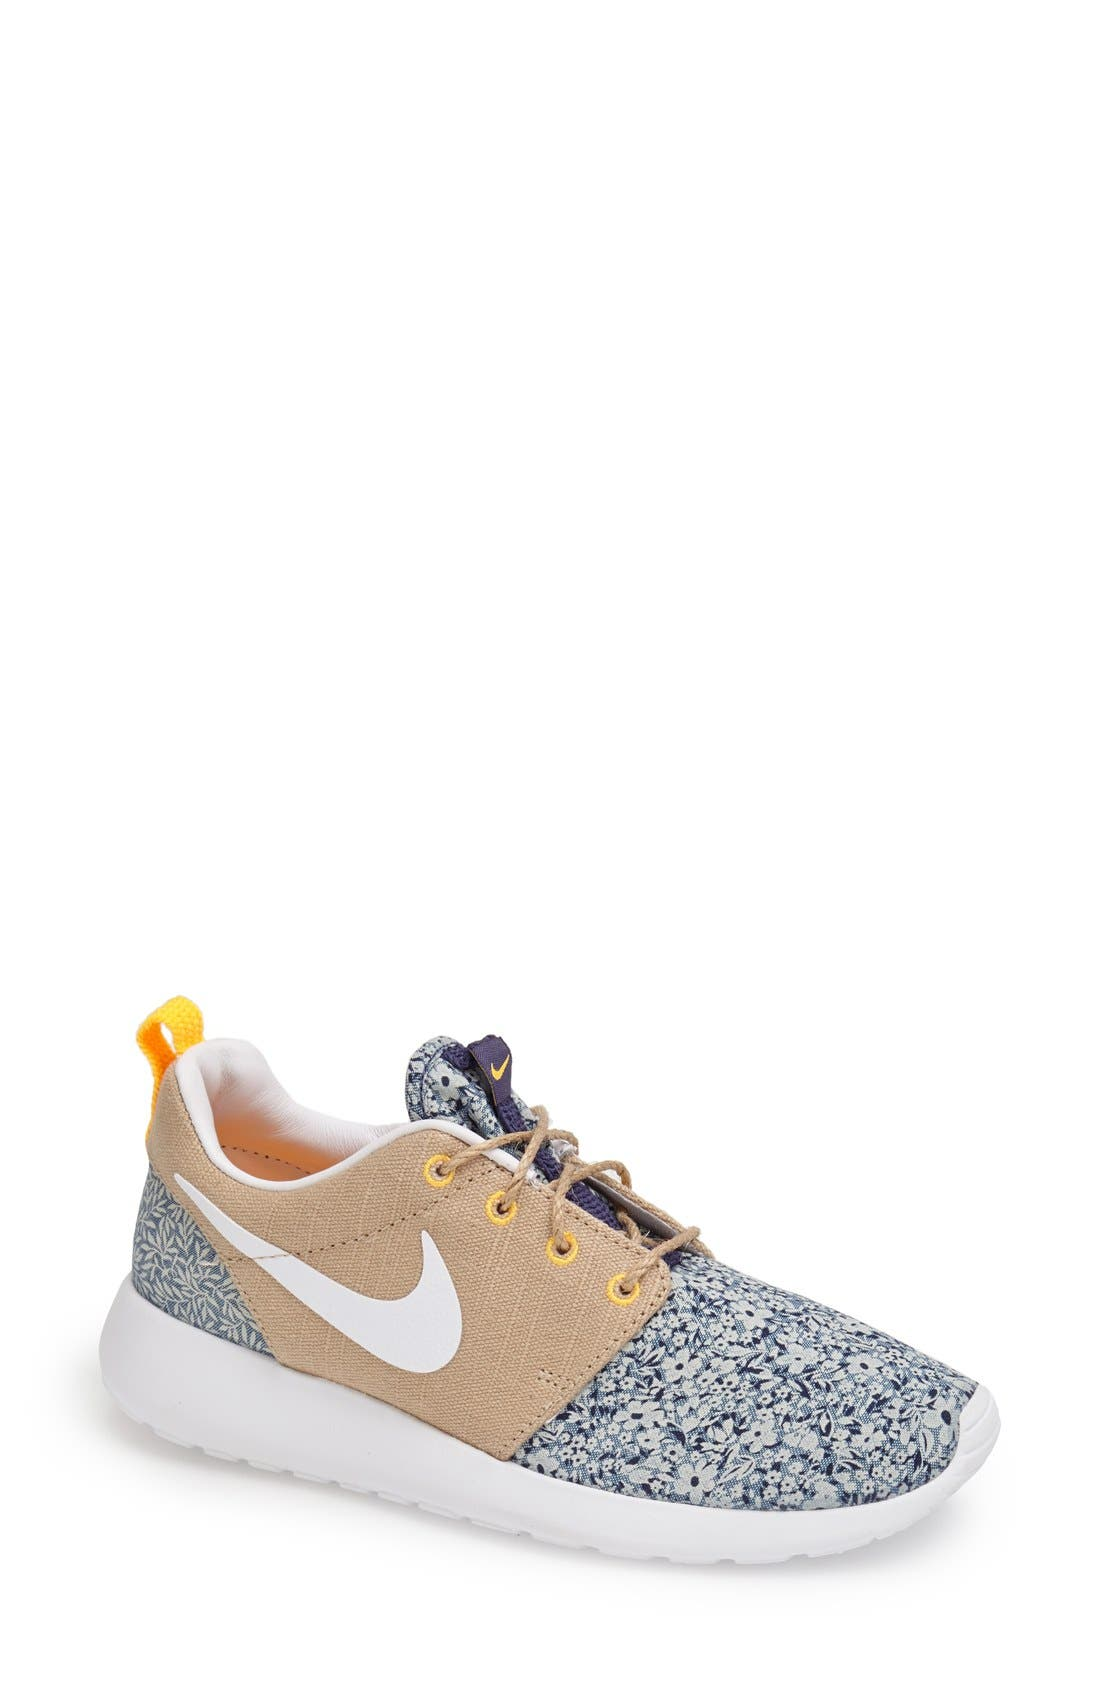 Main Image - Nike 'Roshe Run - Liberty' Sneaker (Women)